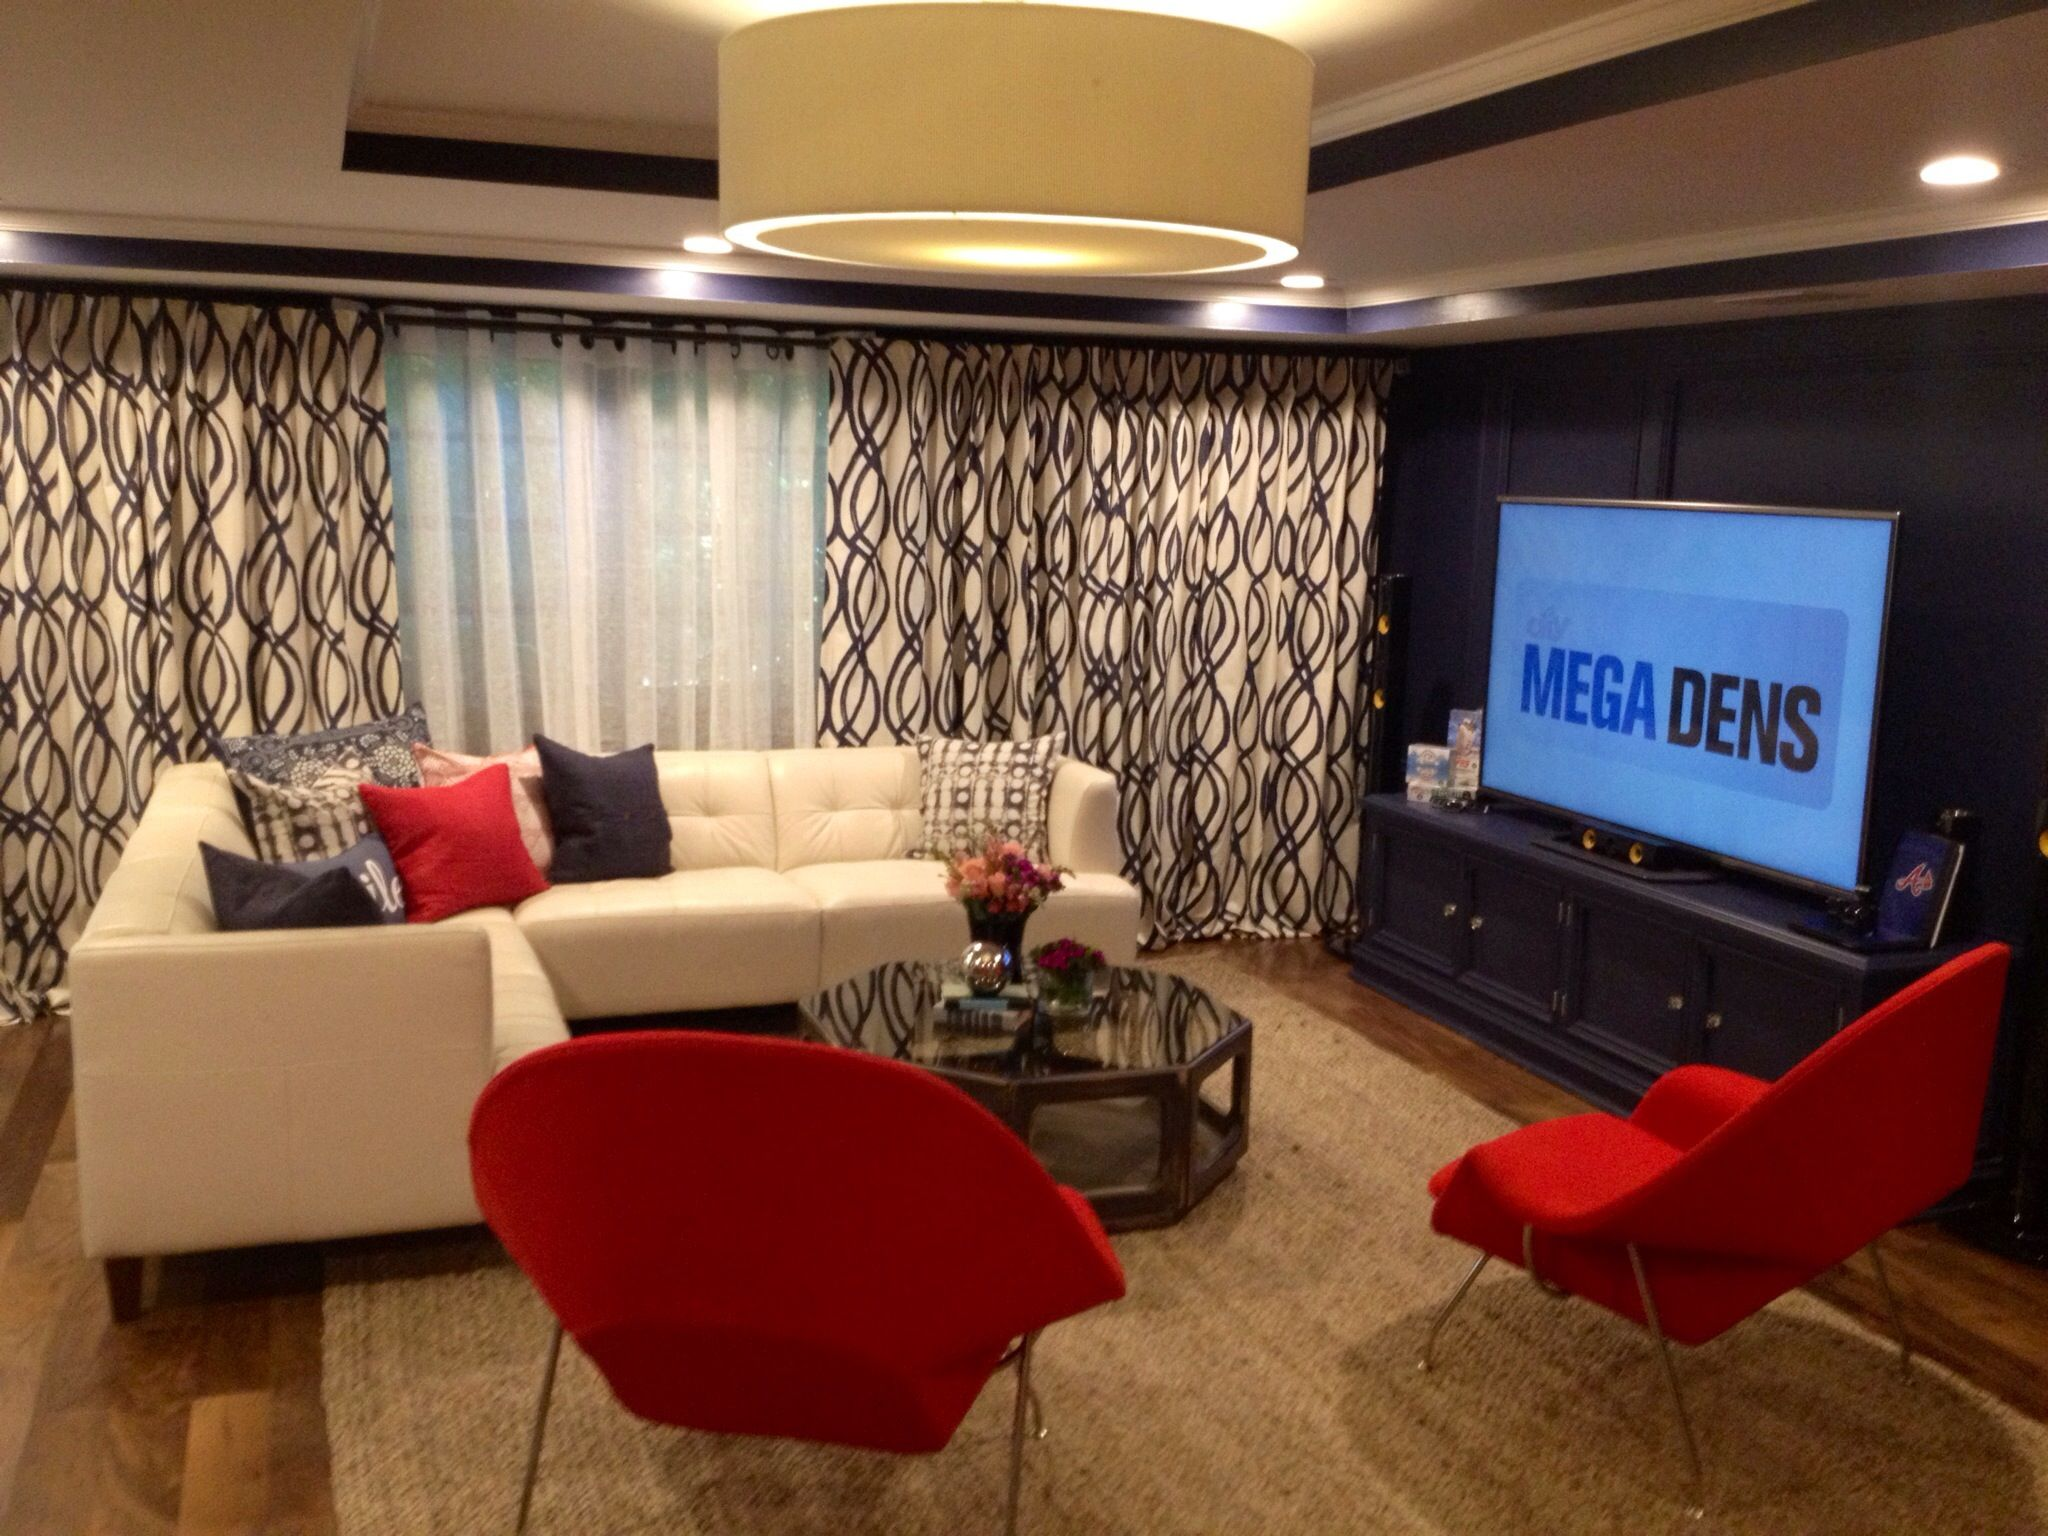 Mlb Atlanta Braves Themed Megaden On Diynetwork Home Home Decor Room